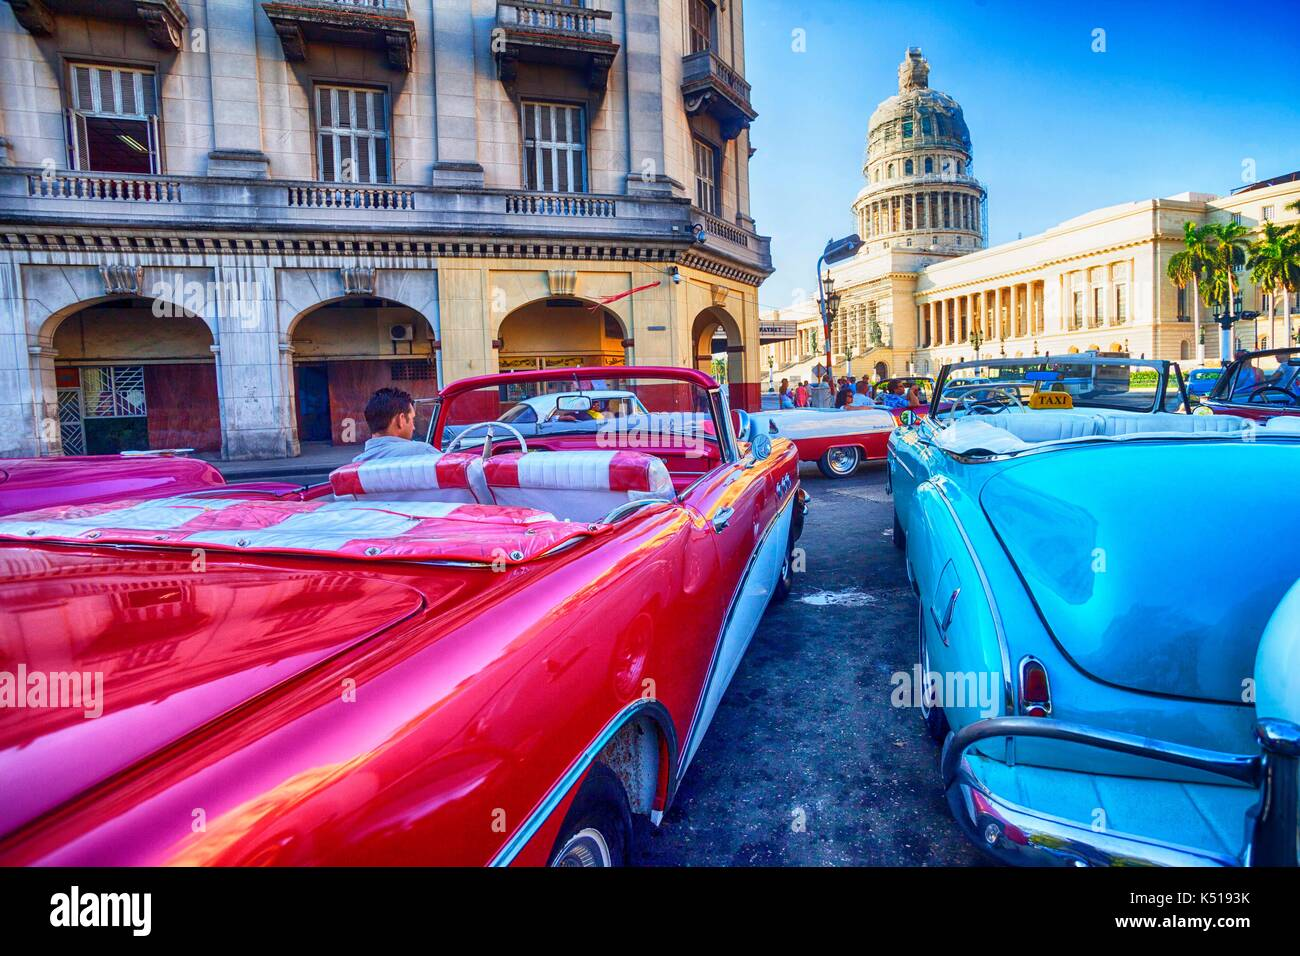 Coche viejo, La Habana, Cuba Imagen De Stock